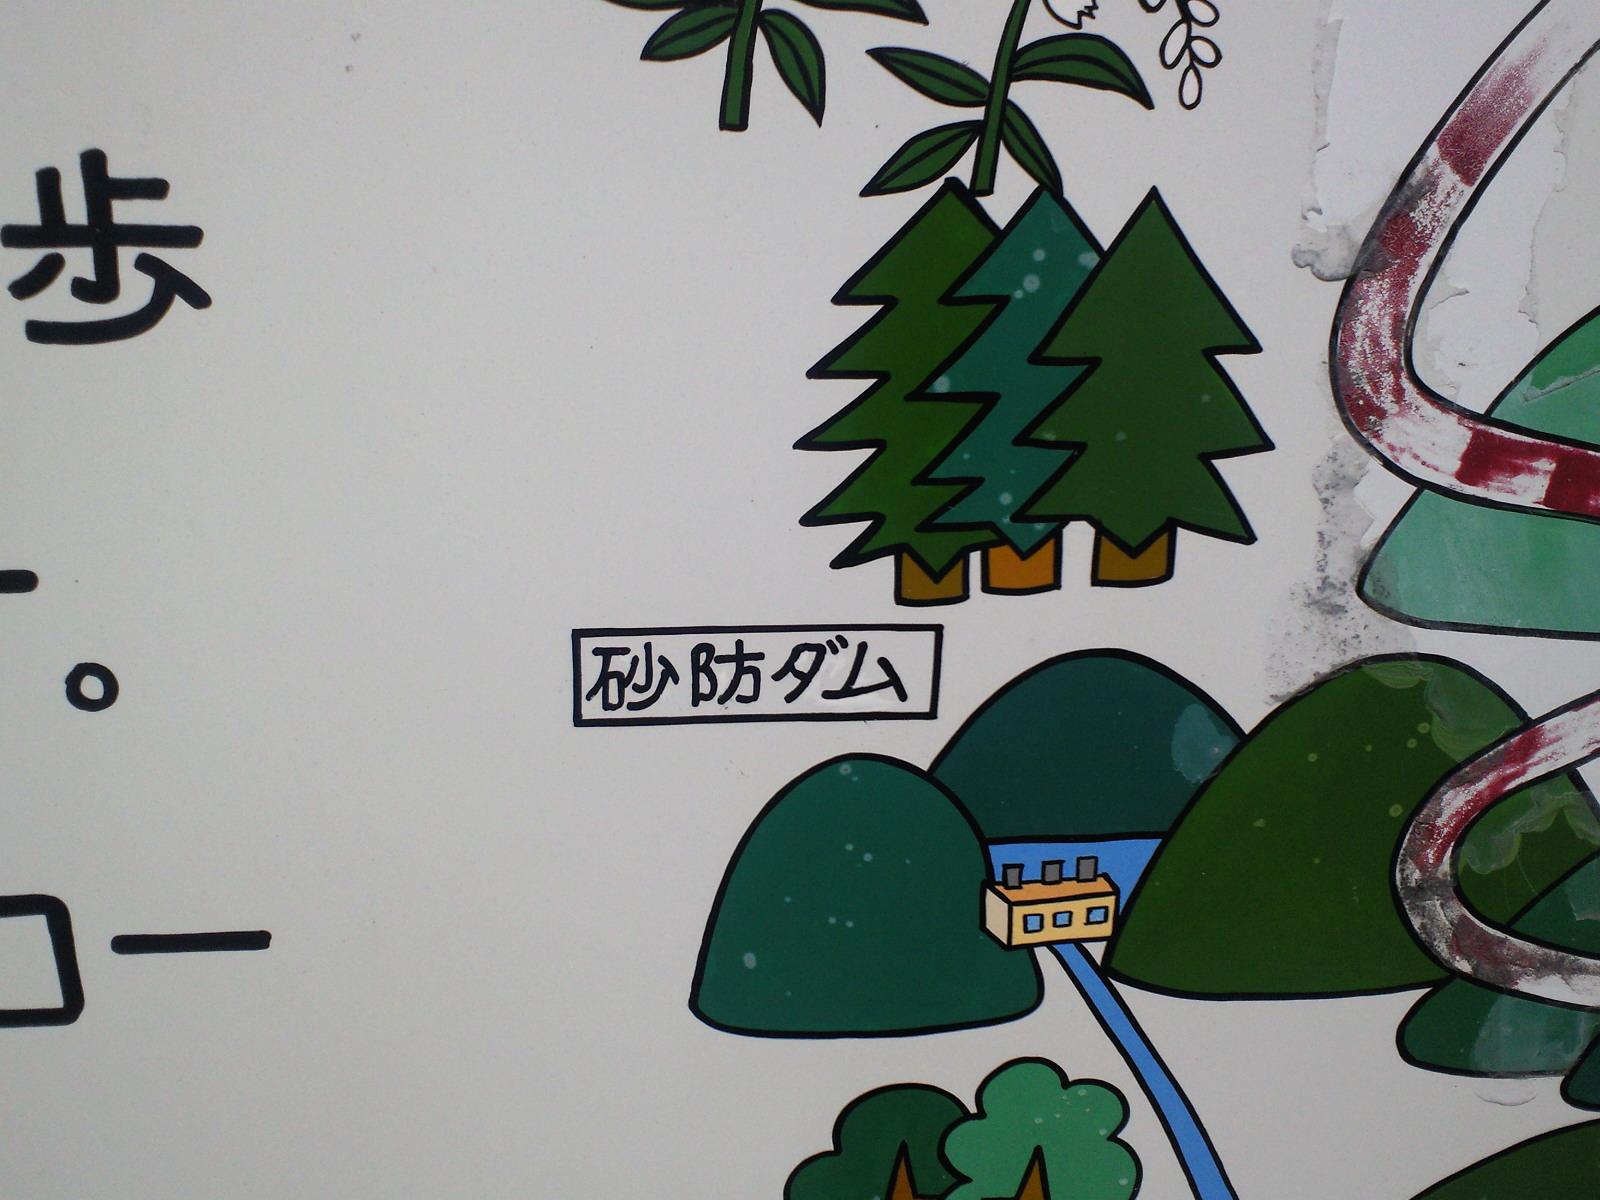 JR四国非提供:四国珠玉の駅紹介シリーズ「阿波大宮」_c0001670_22304623.jpg